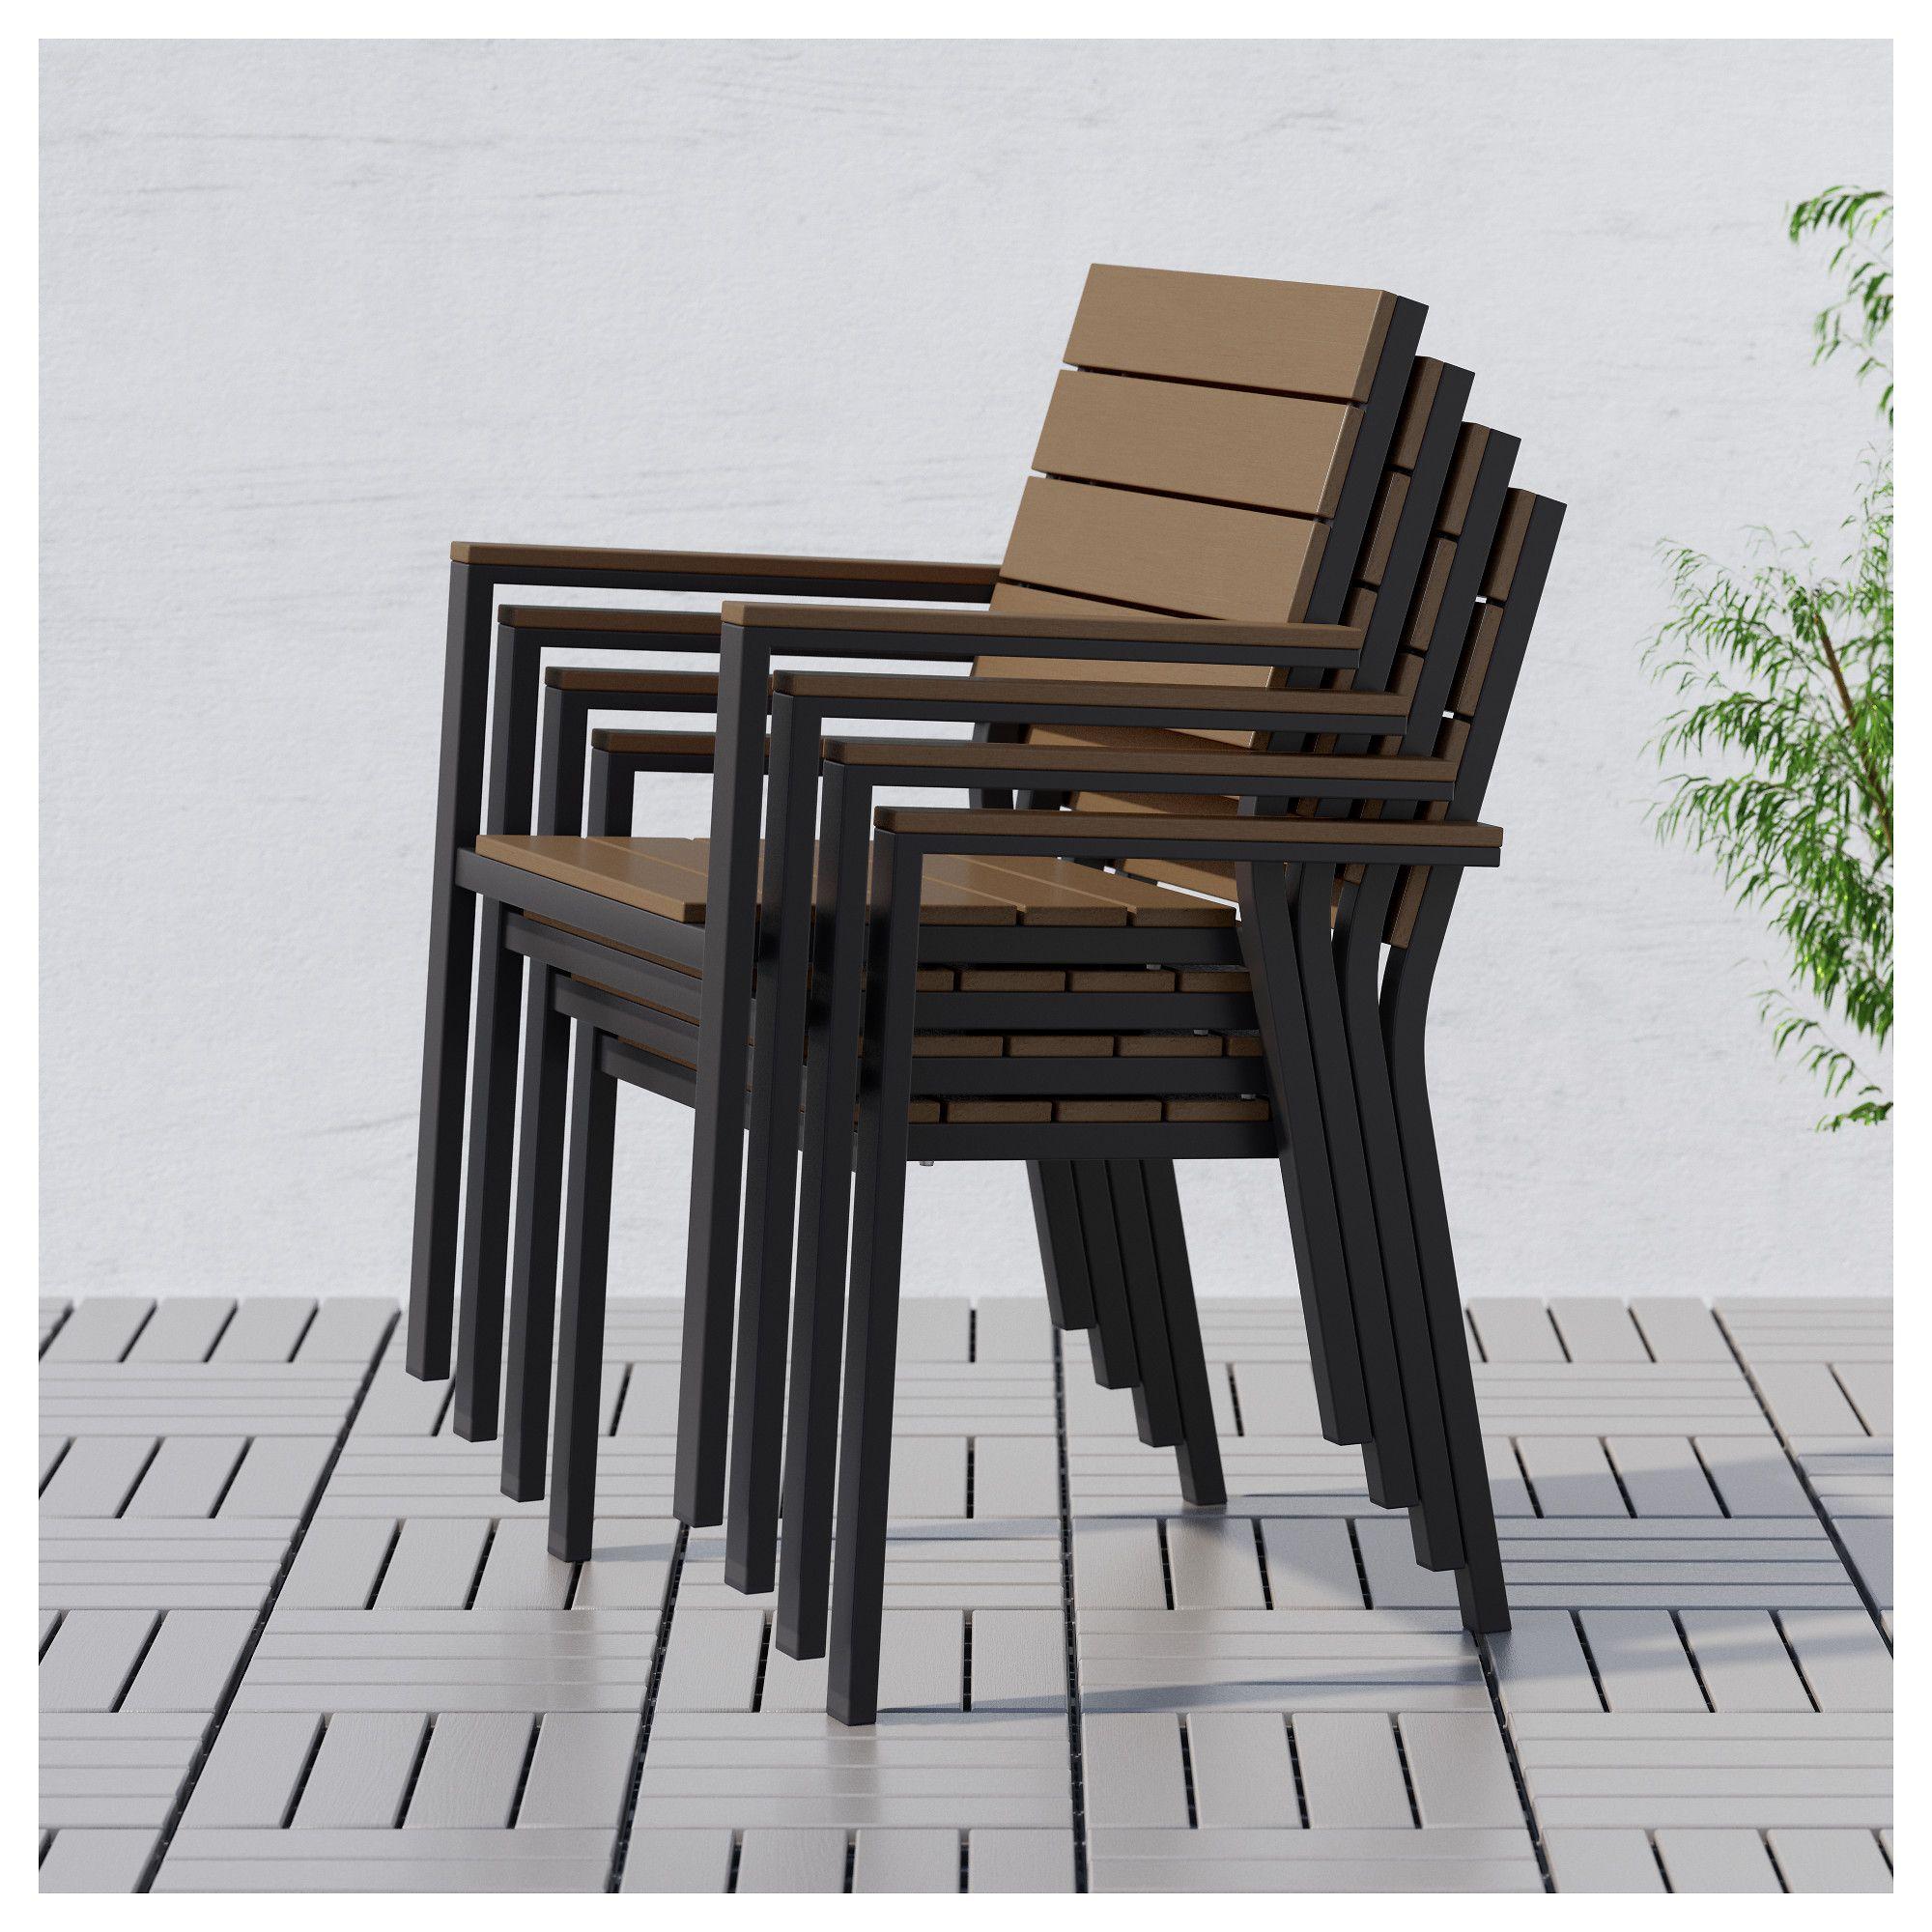 Furniture Outdoor Mobel FurnishingsStarke And Home cL4q5RS3jA